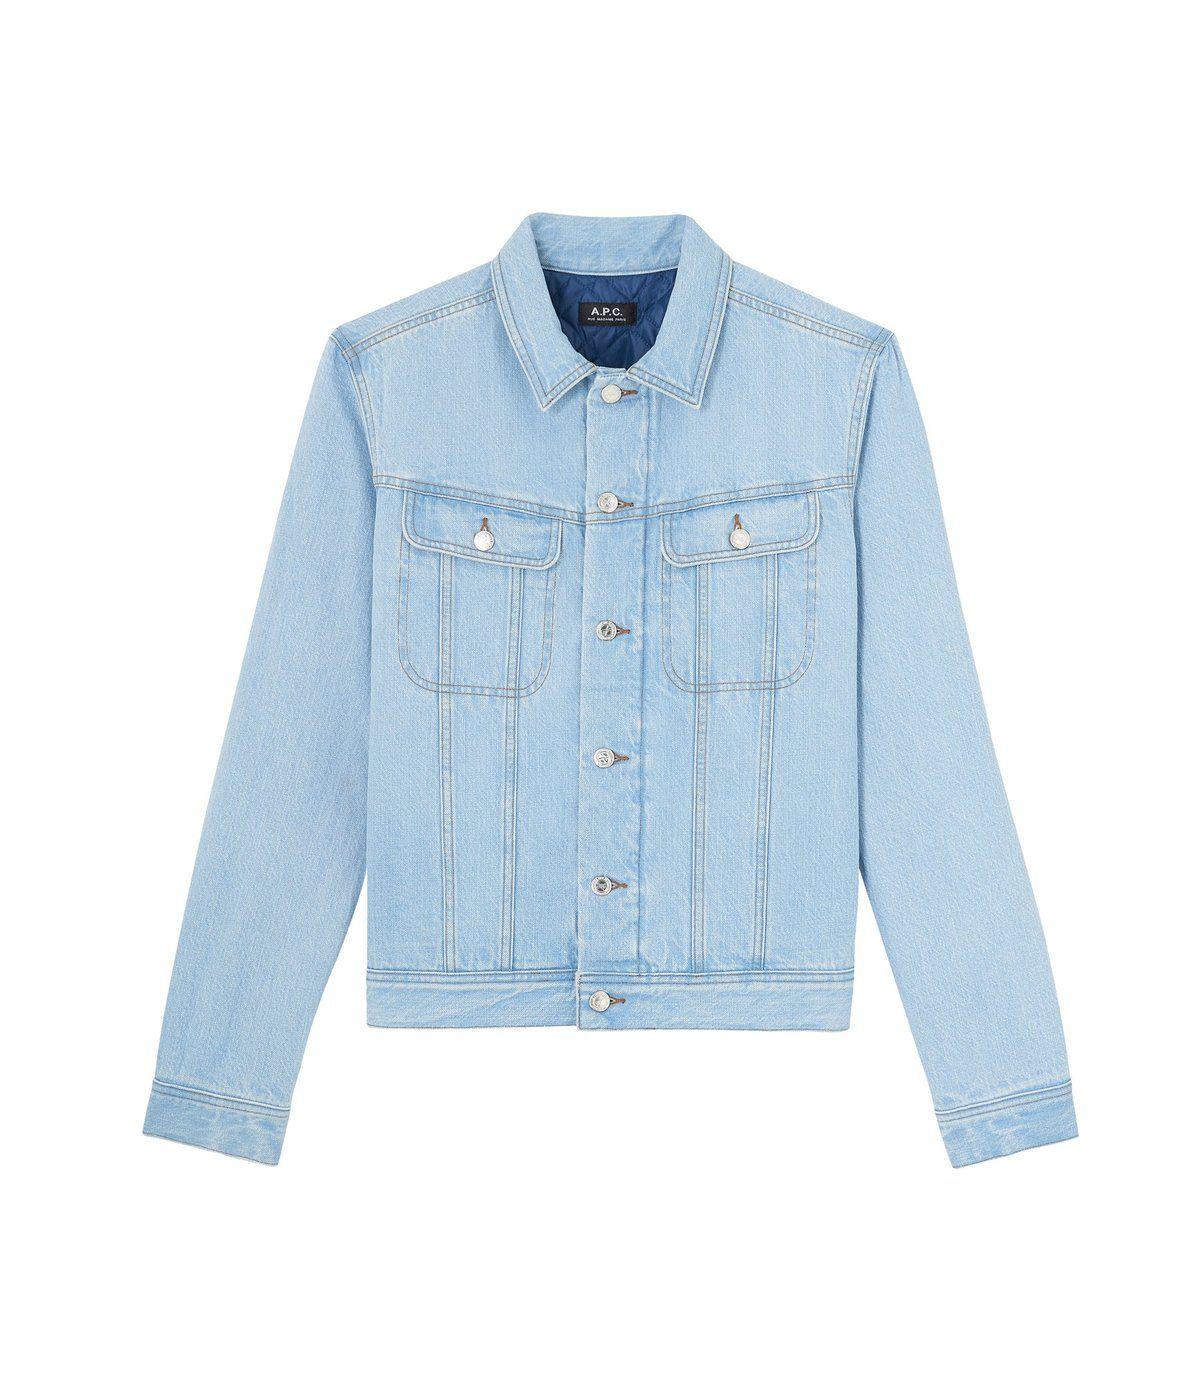 Khanomak Kids Girls Denim Distressed Button Up Jacket